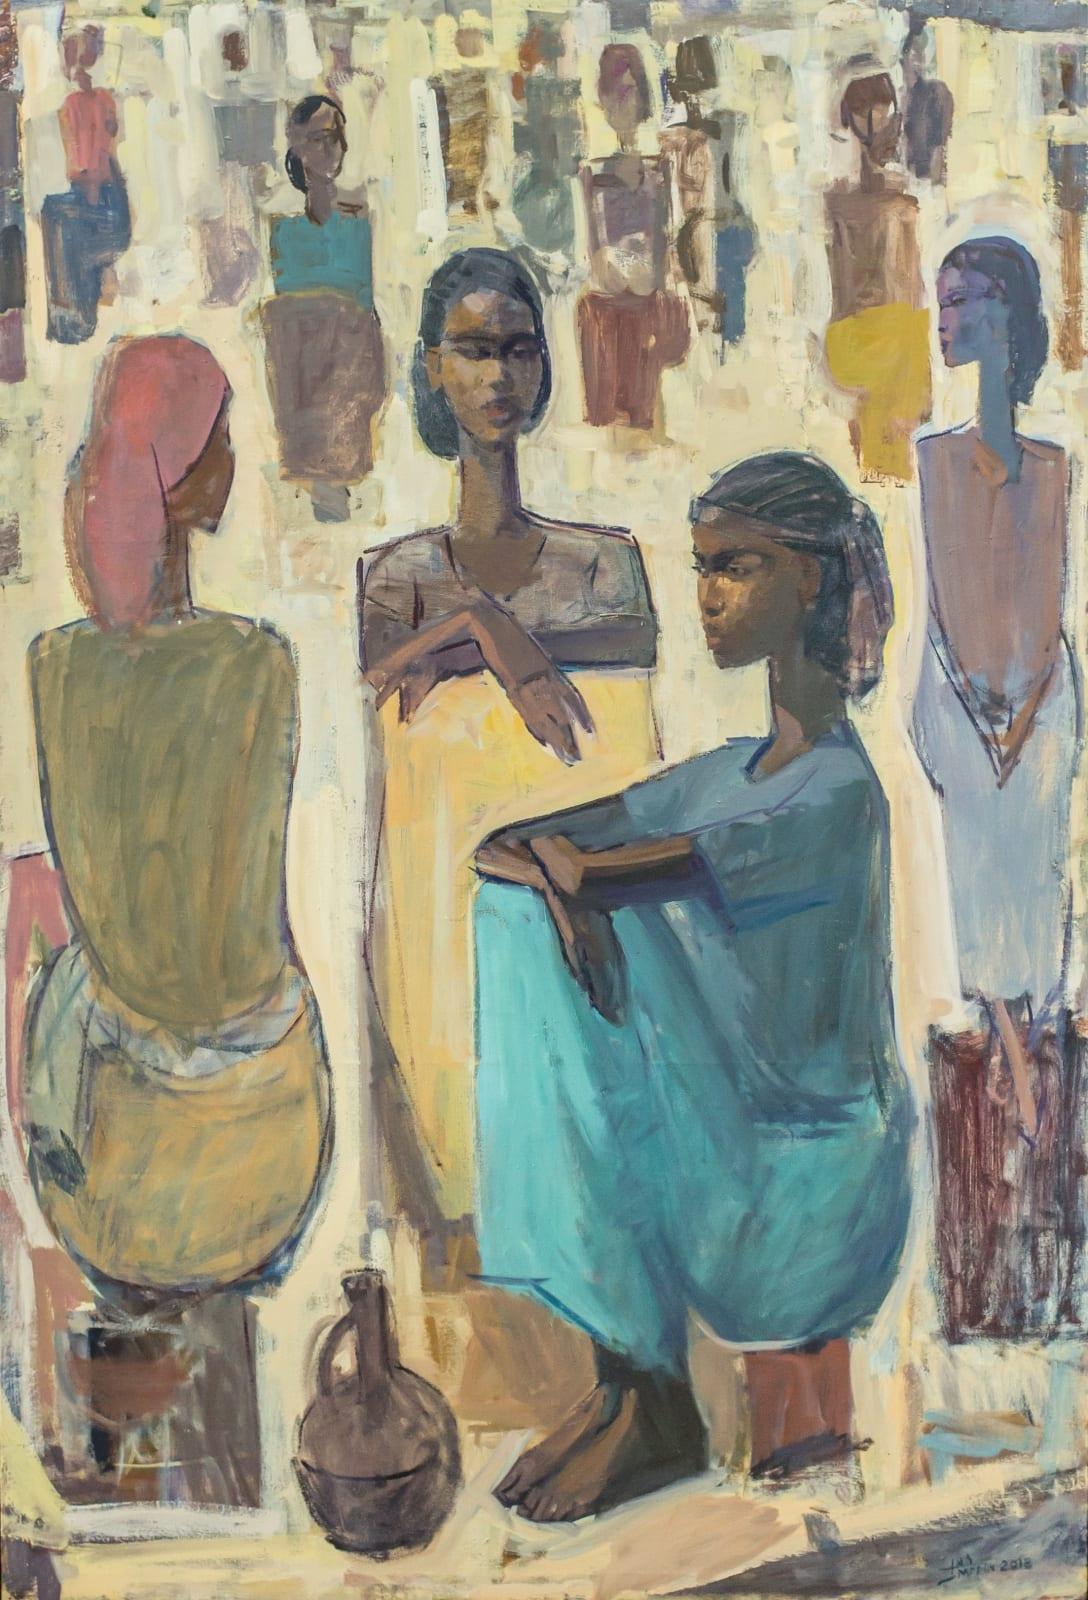 Tadesse Mesfin, Pillars of Life: Guleet, 2018. Courtesy of the Artist and Addis Fine Art